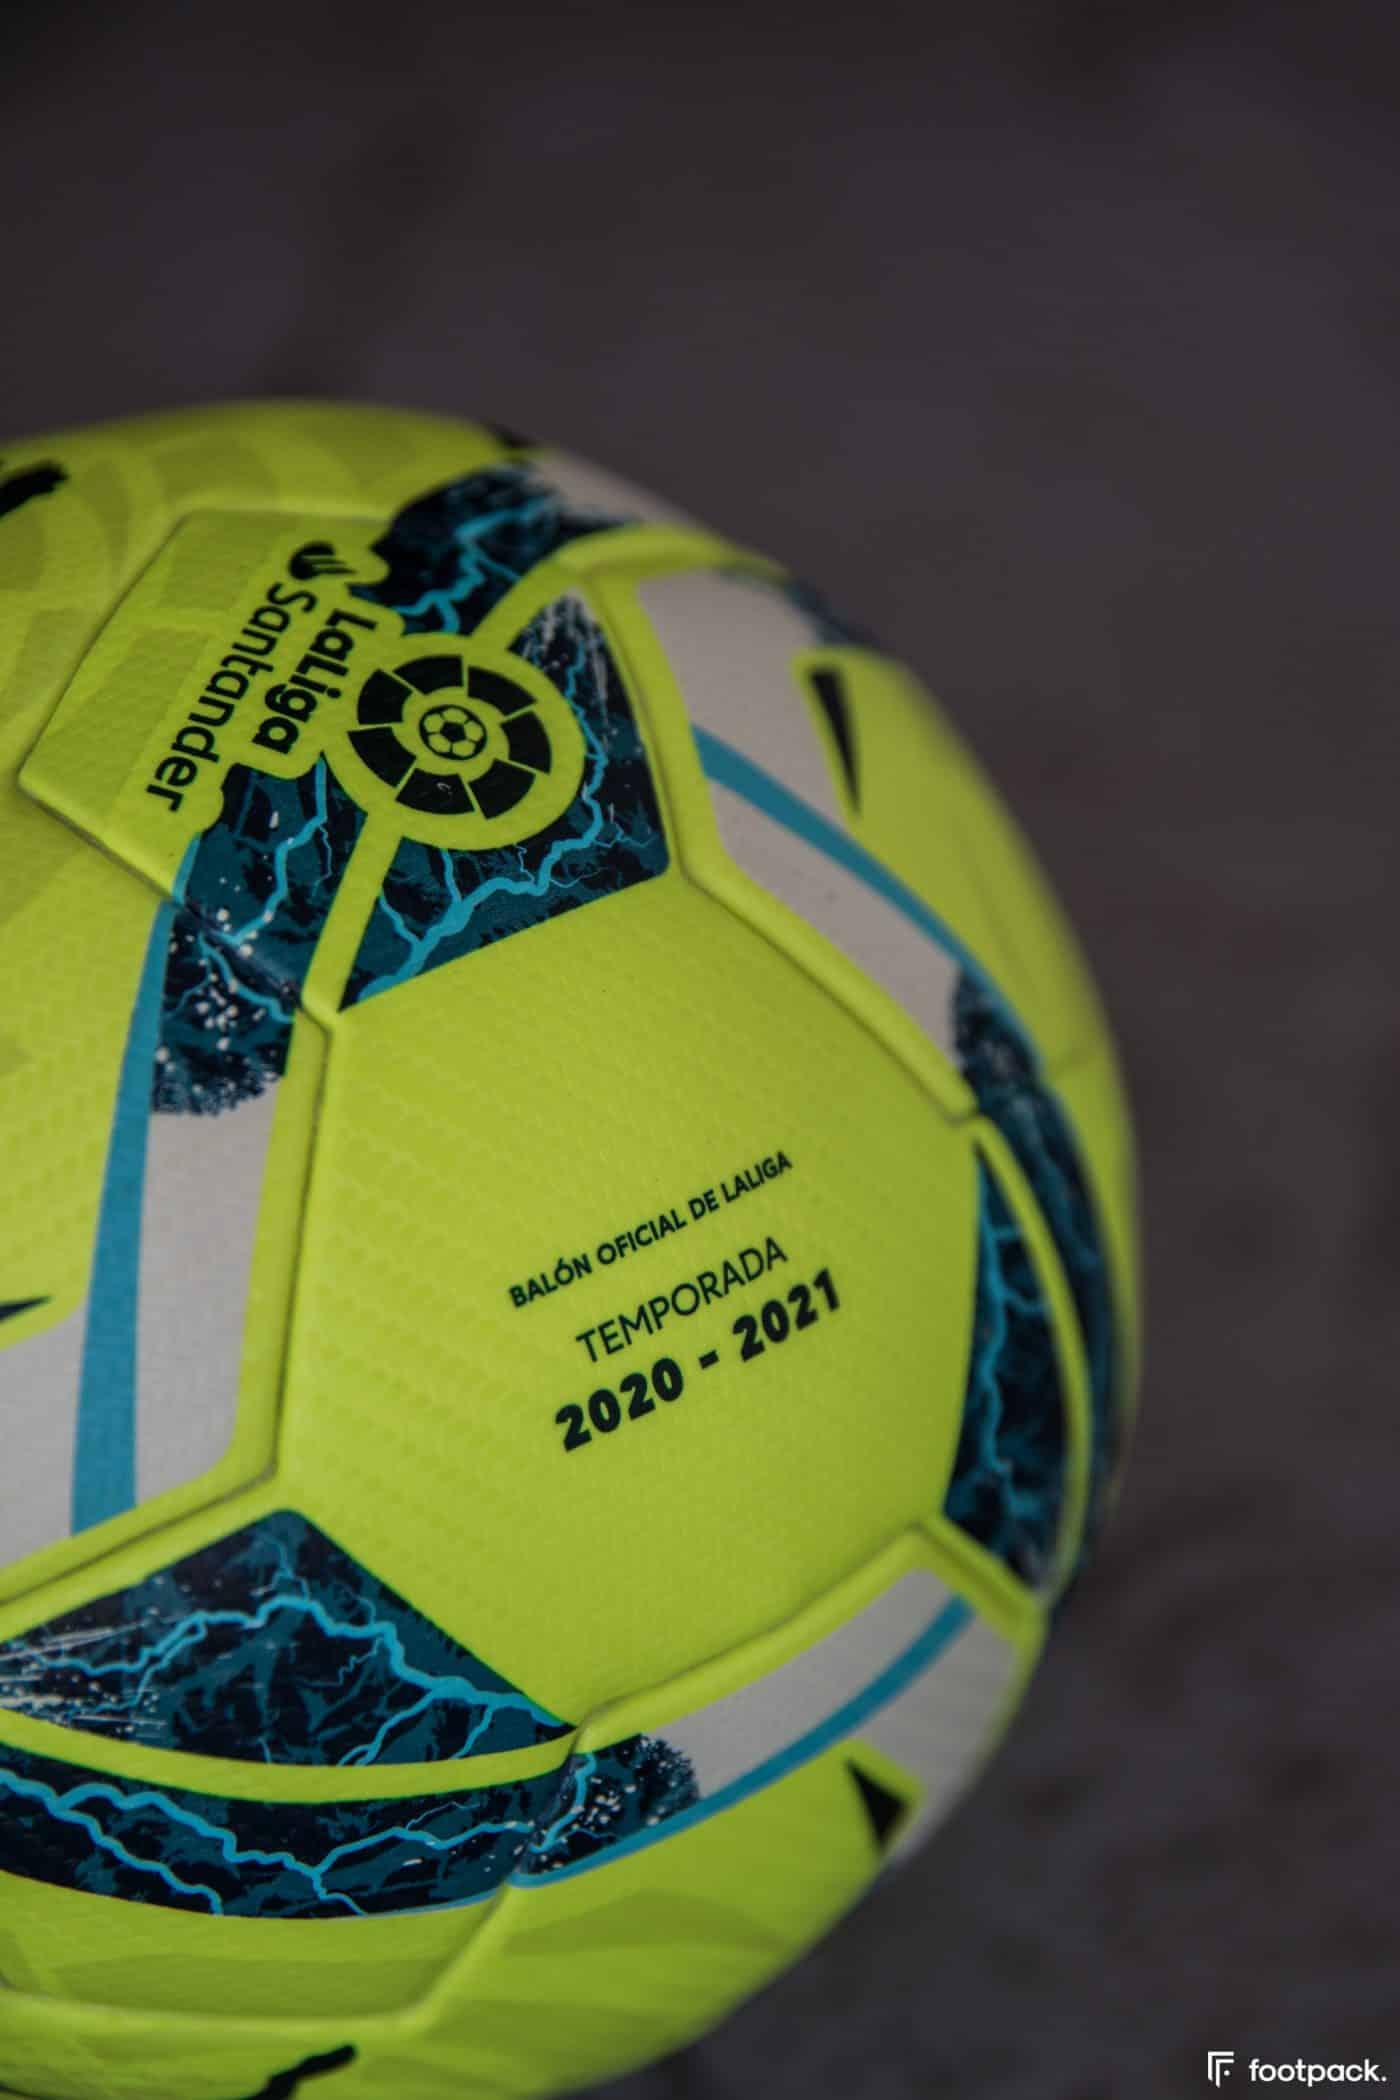 ballon-championnat-espagne-la-liga-2020-2021-puma-footpack-17